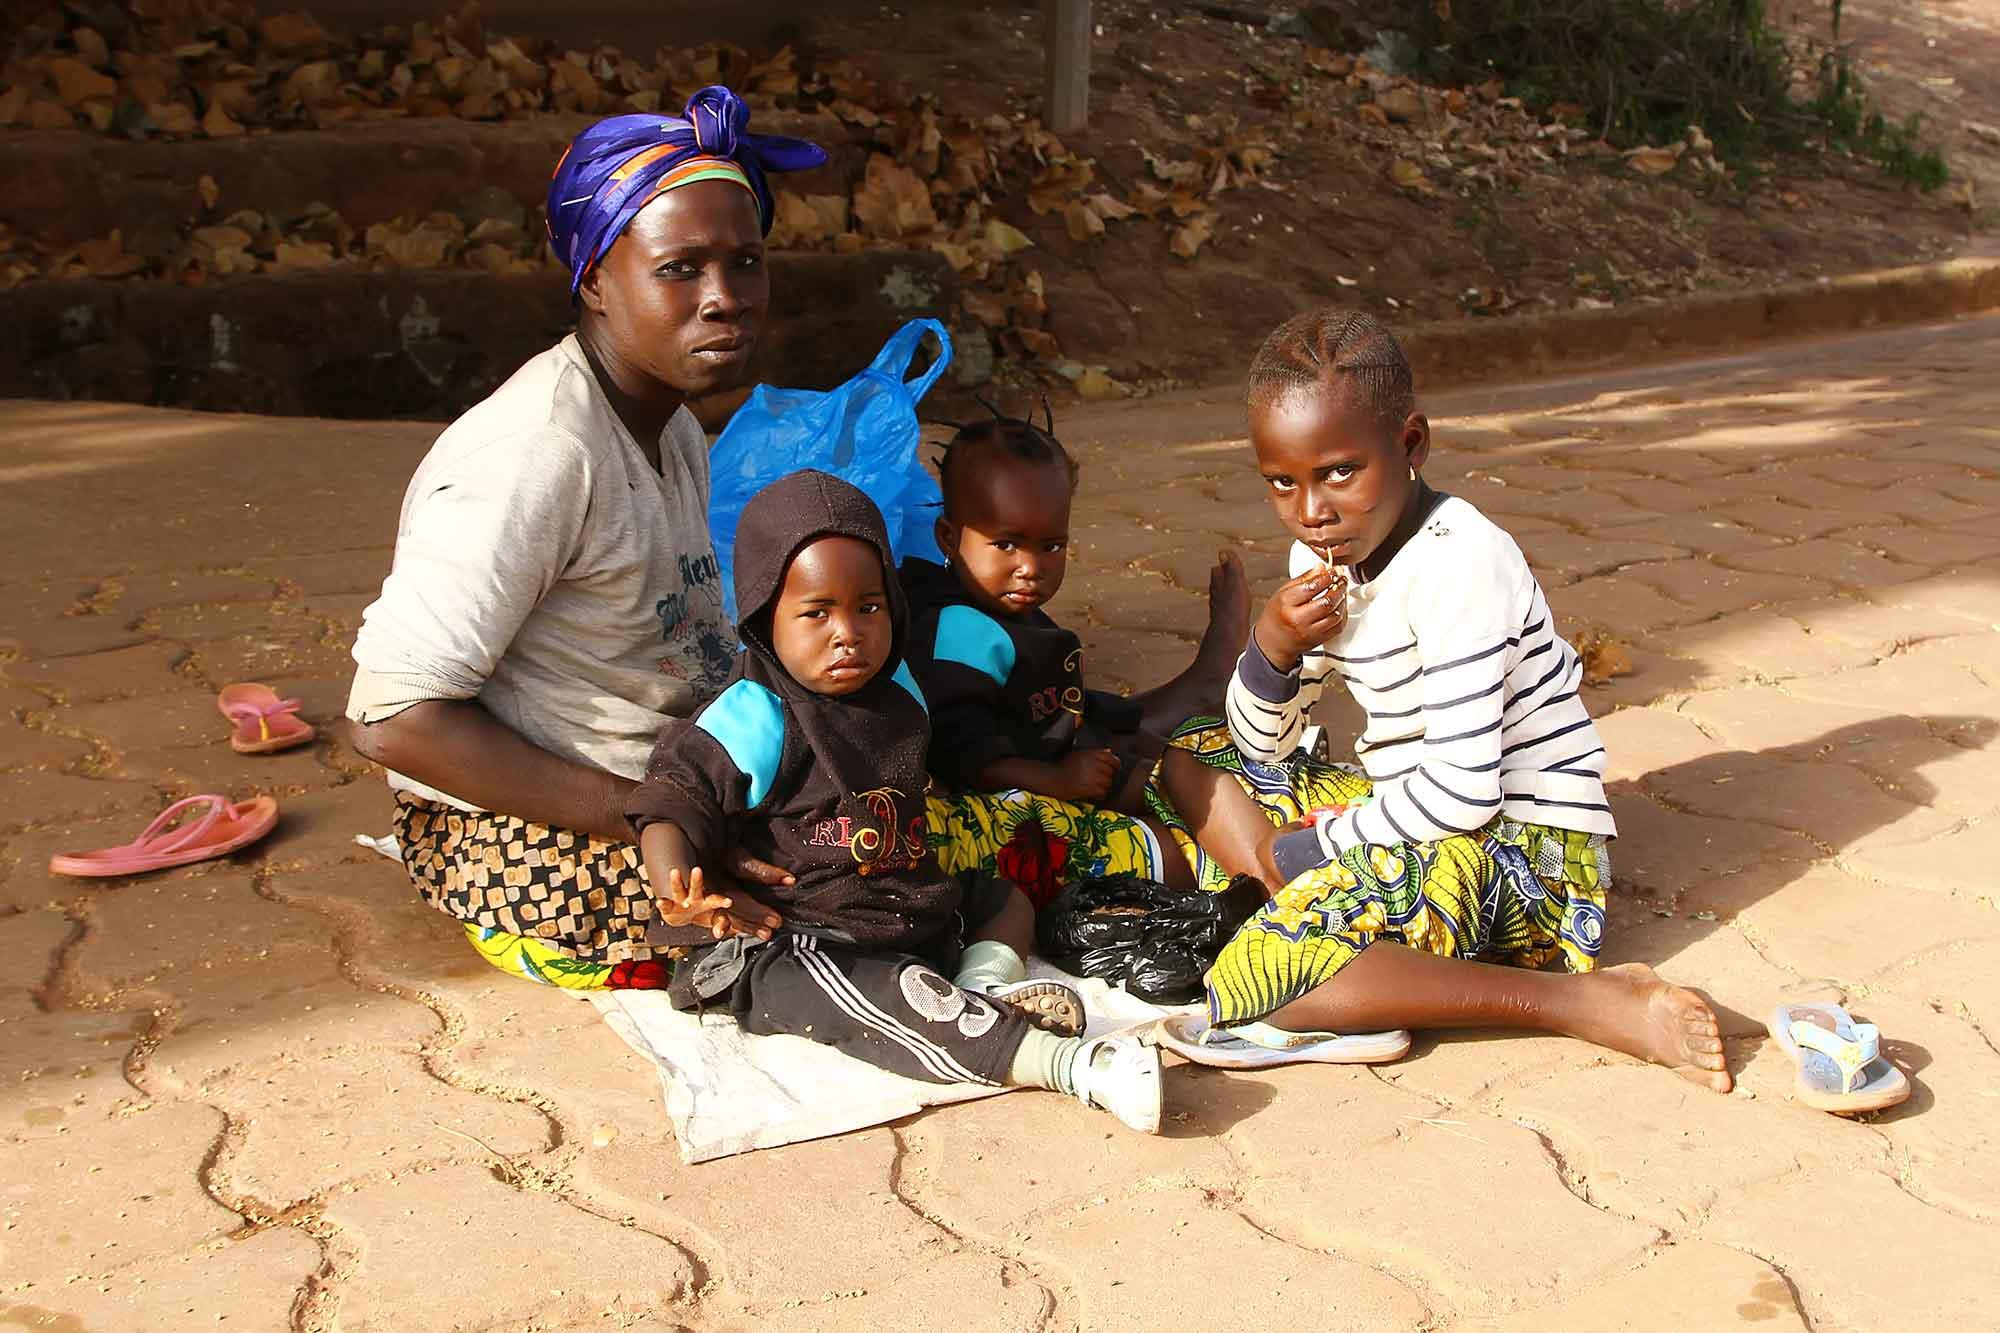 family-sitting-in-streets-of-bobodioulasso-burkina-faso